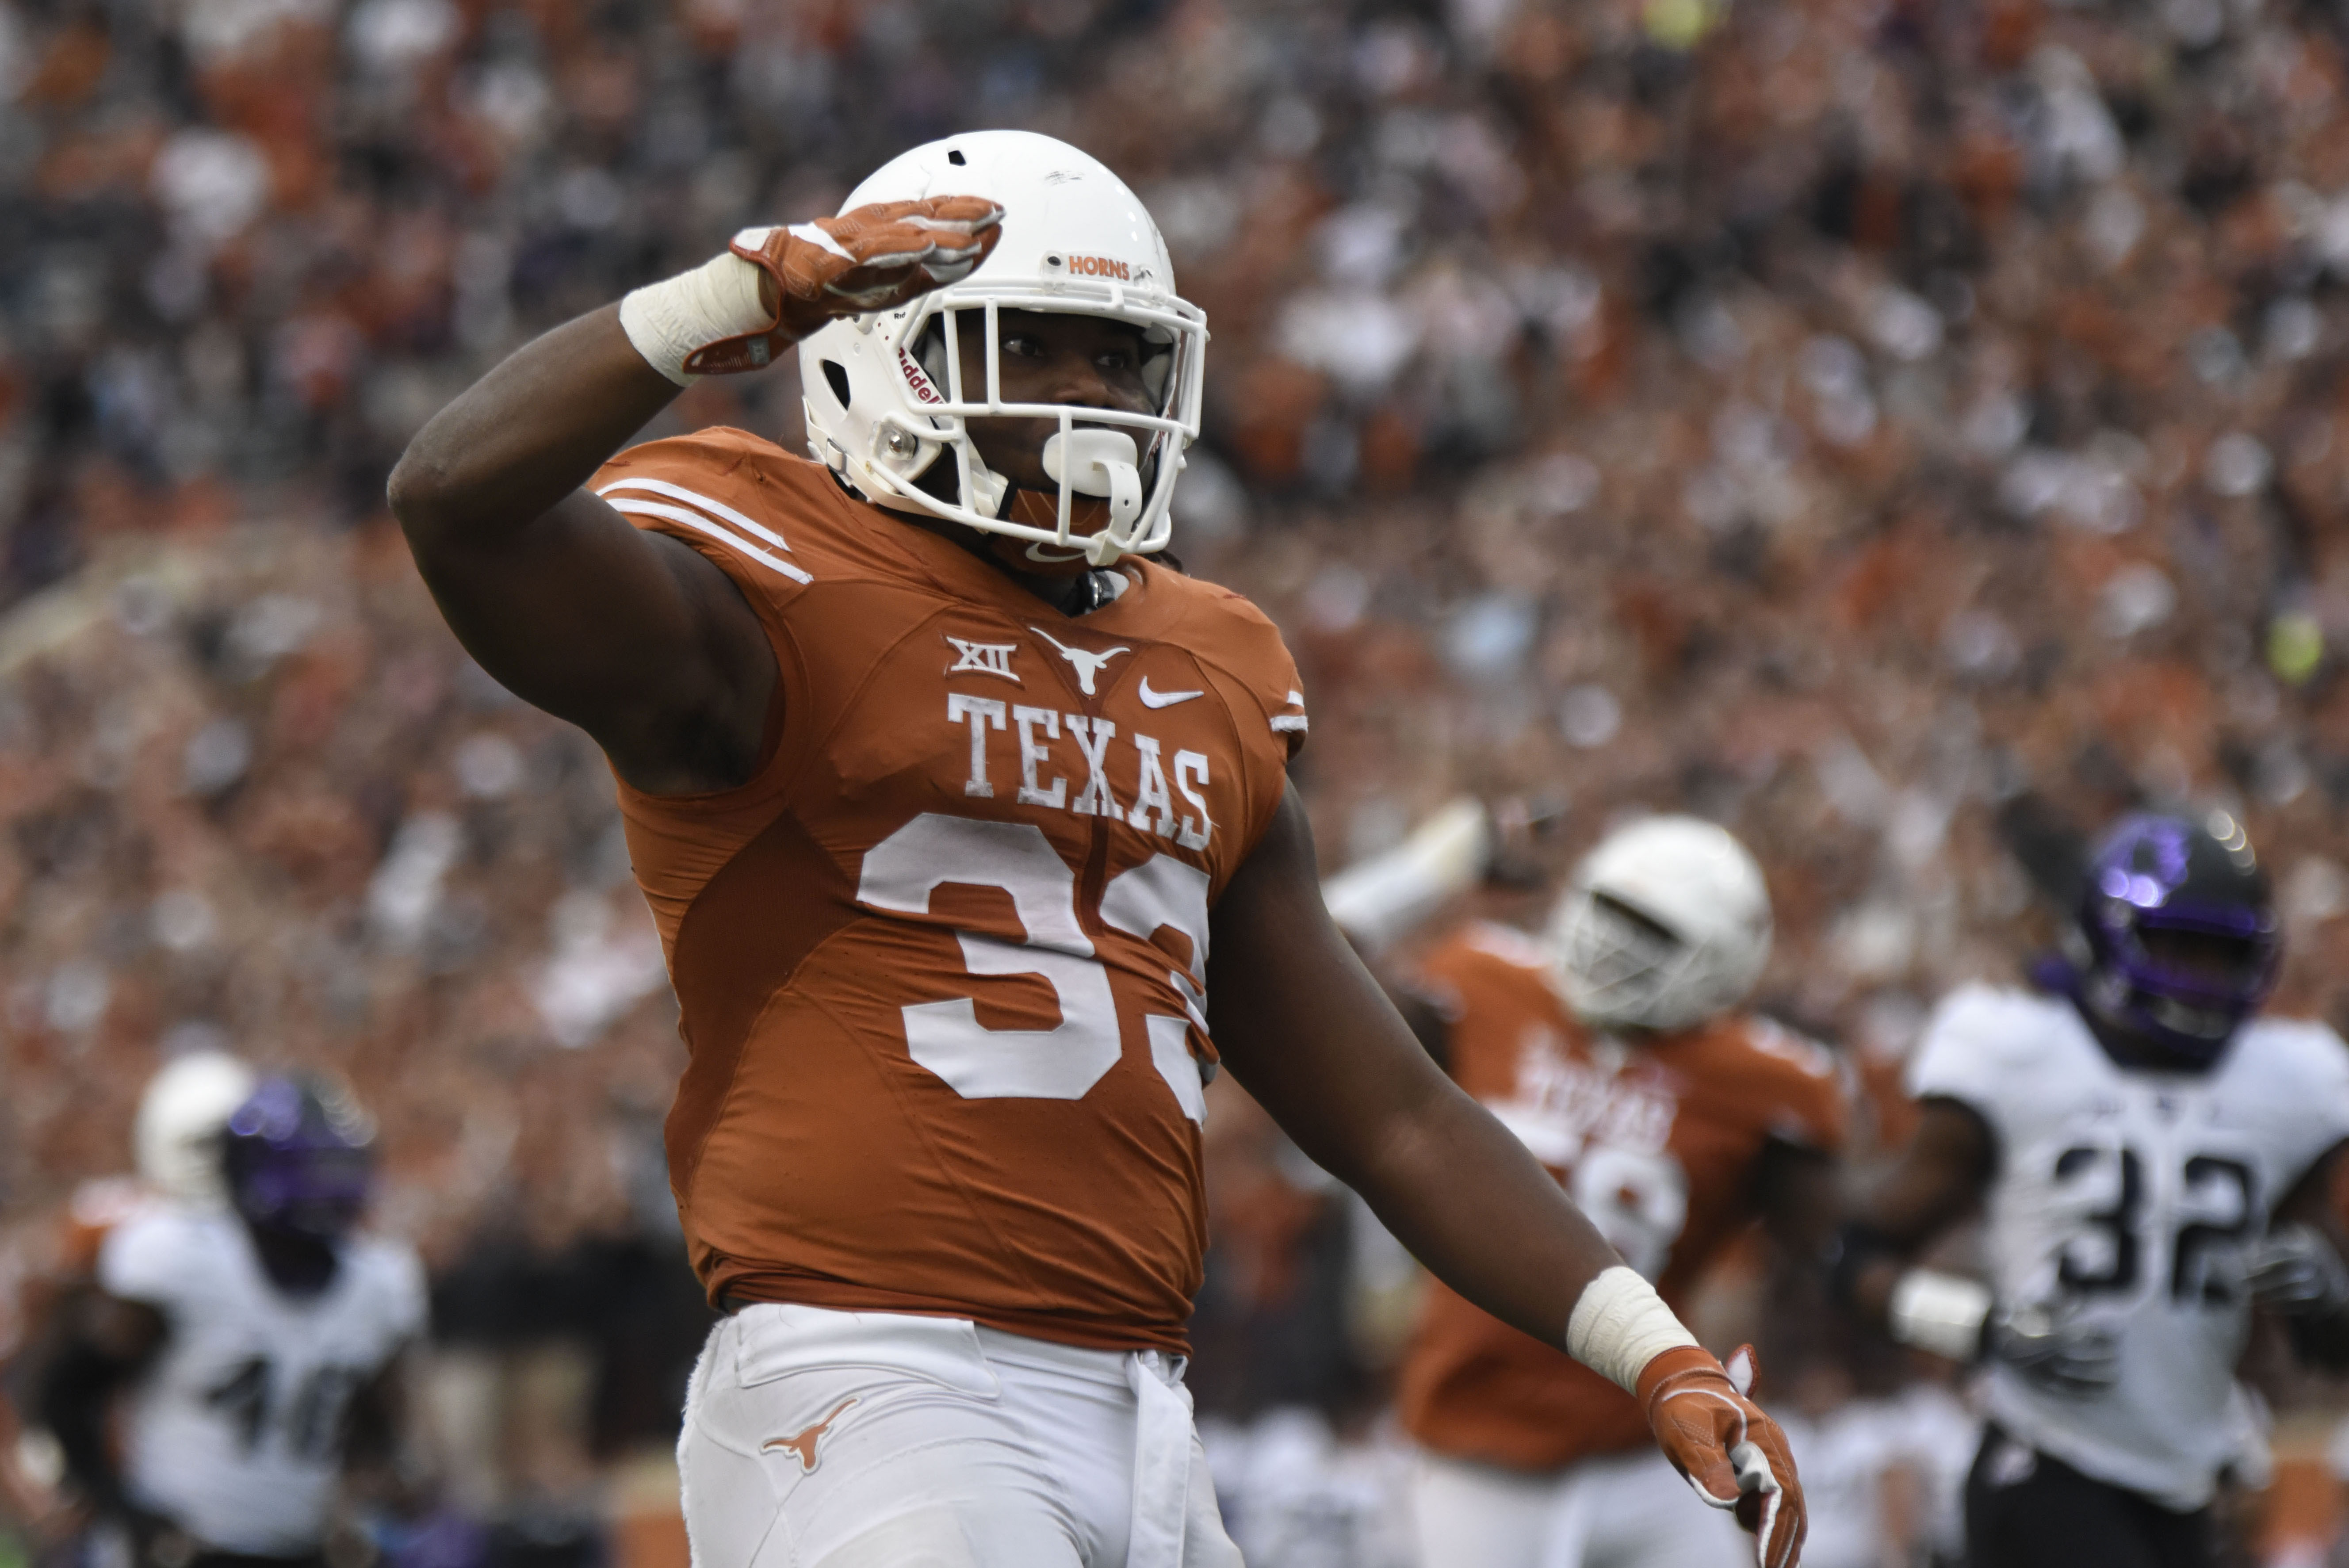 9702272-ncaa-football-texas-christian-at-texas